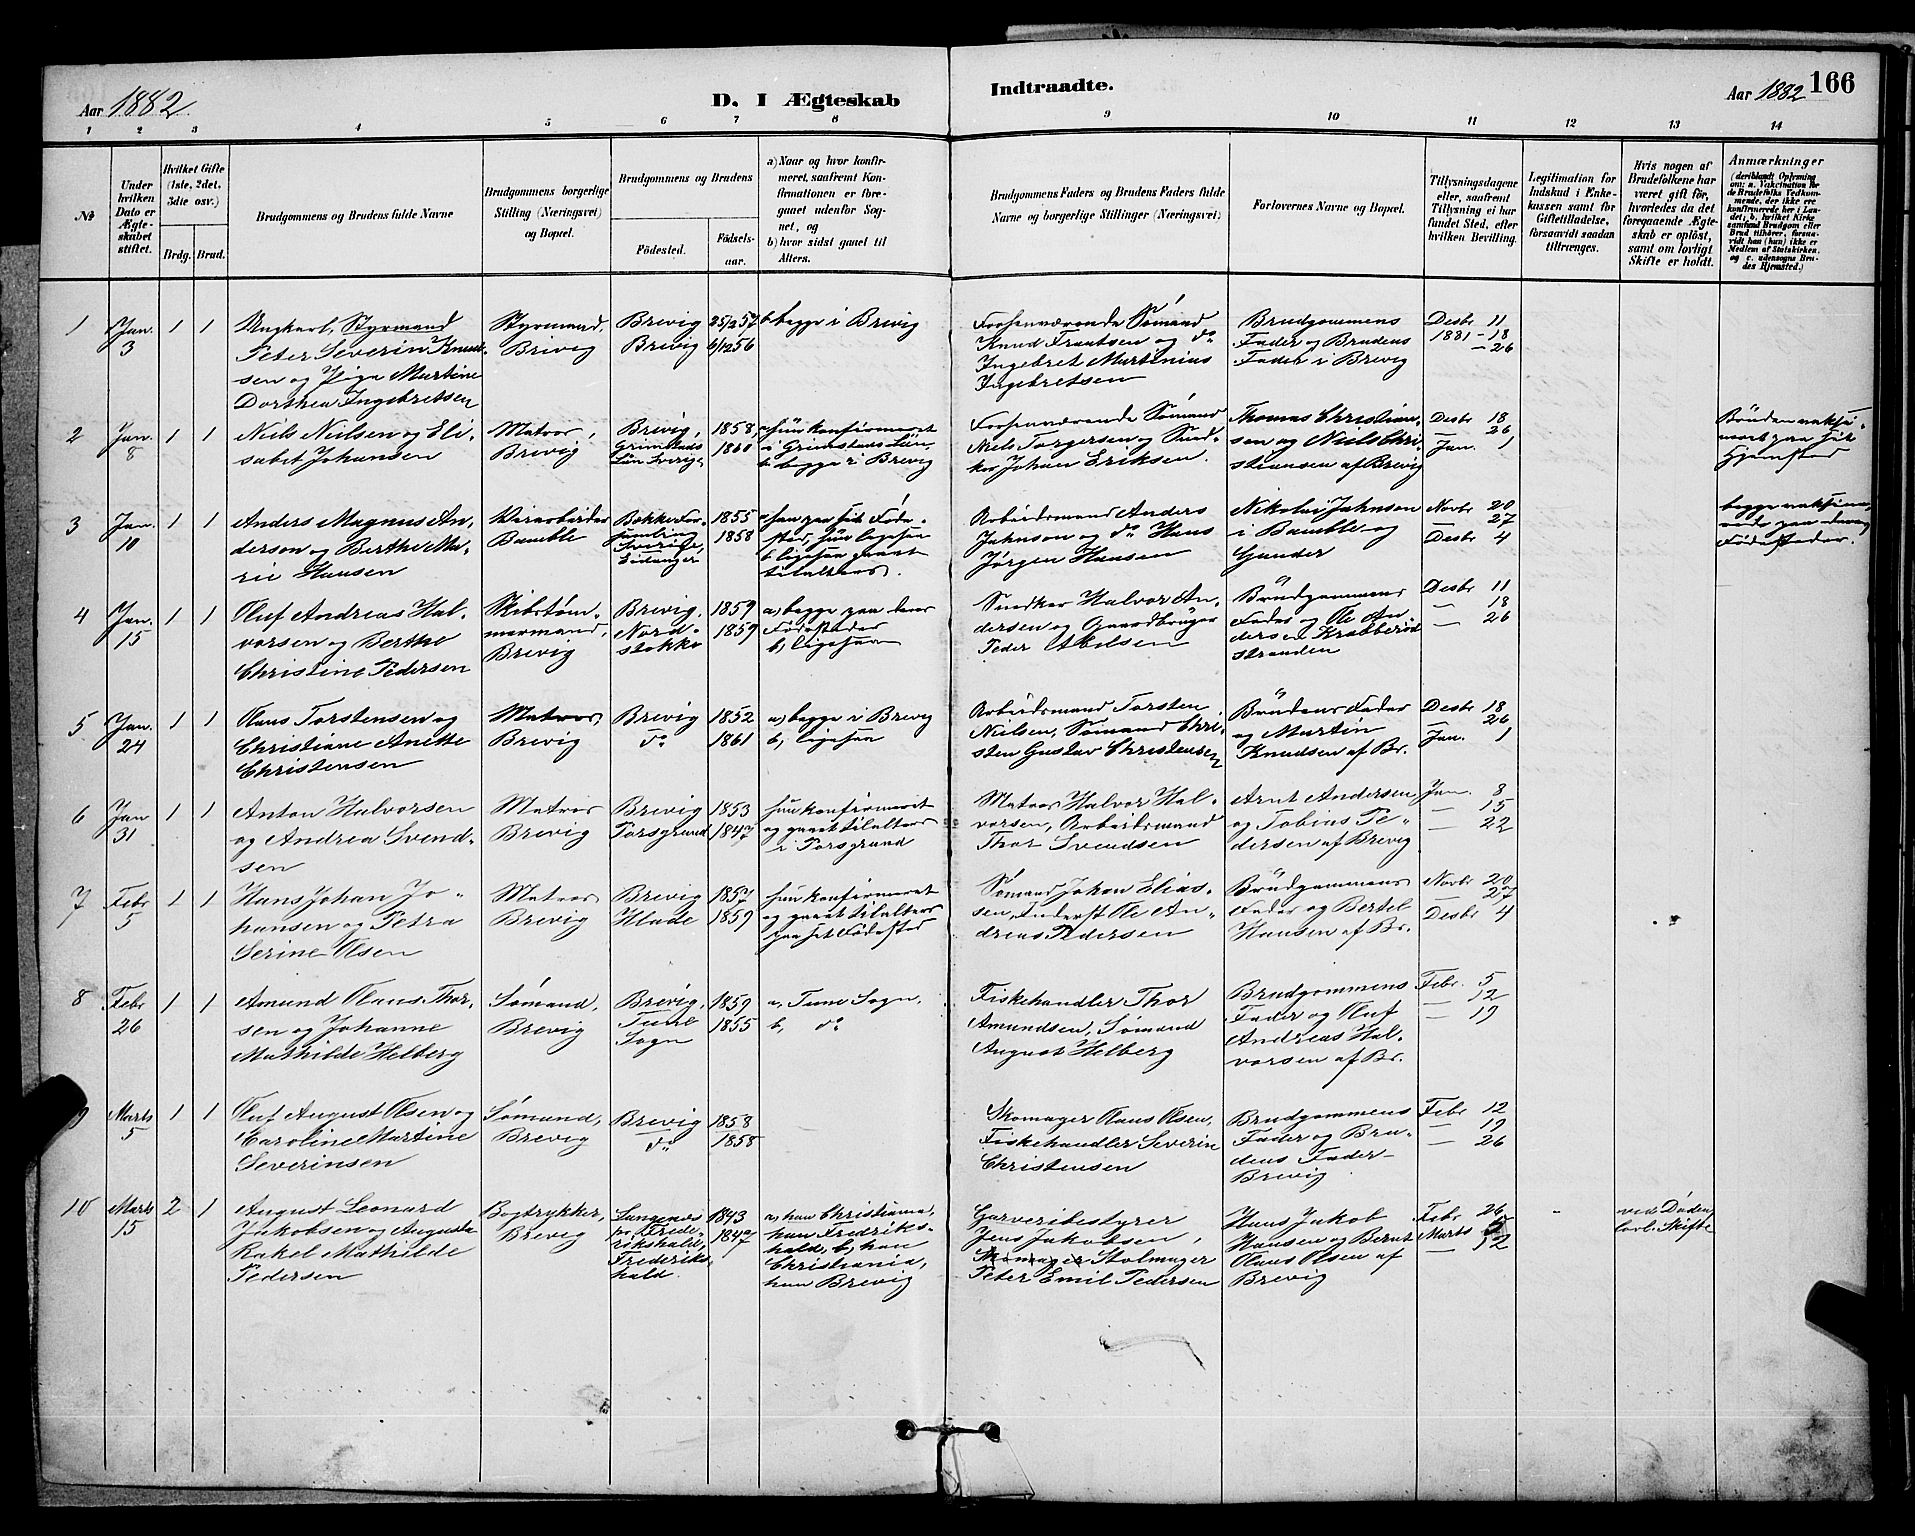 SAKO, Brevik kirkebøker, G/Ga/L0004: Klokkerbok nr. 4, 1882-1900, s. 166